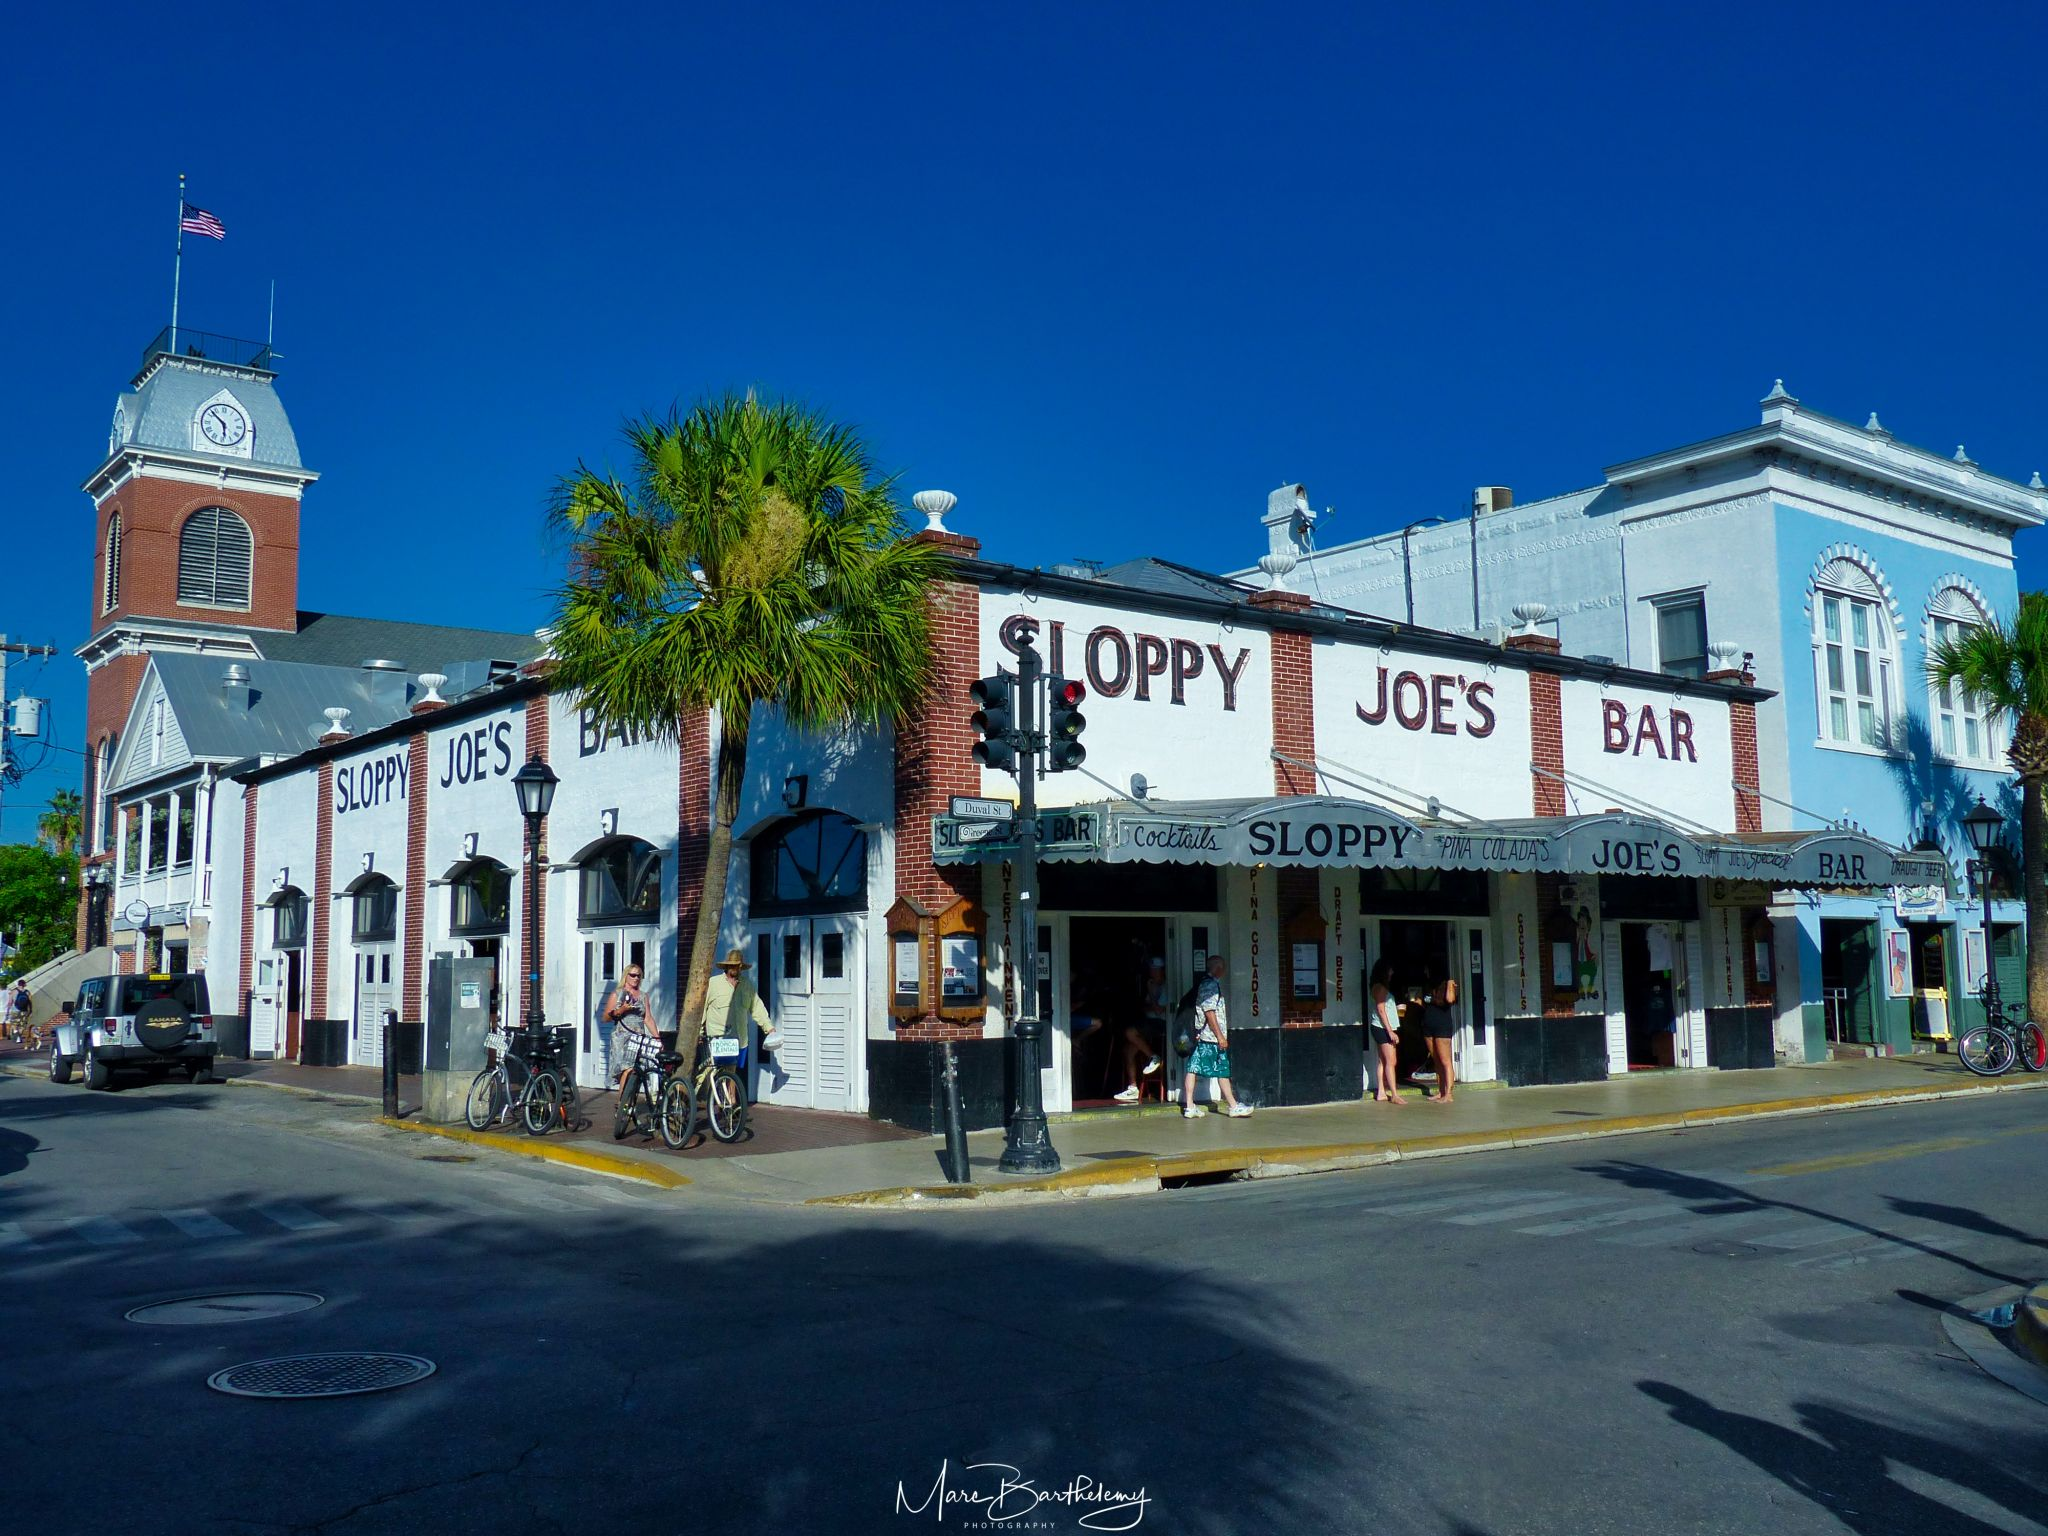 Sloppy Joe's Bar, USA